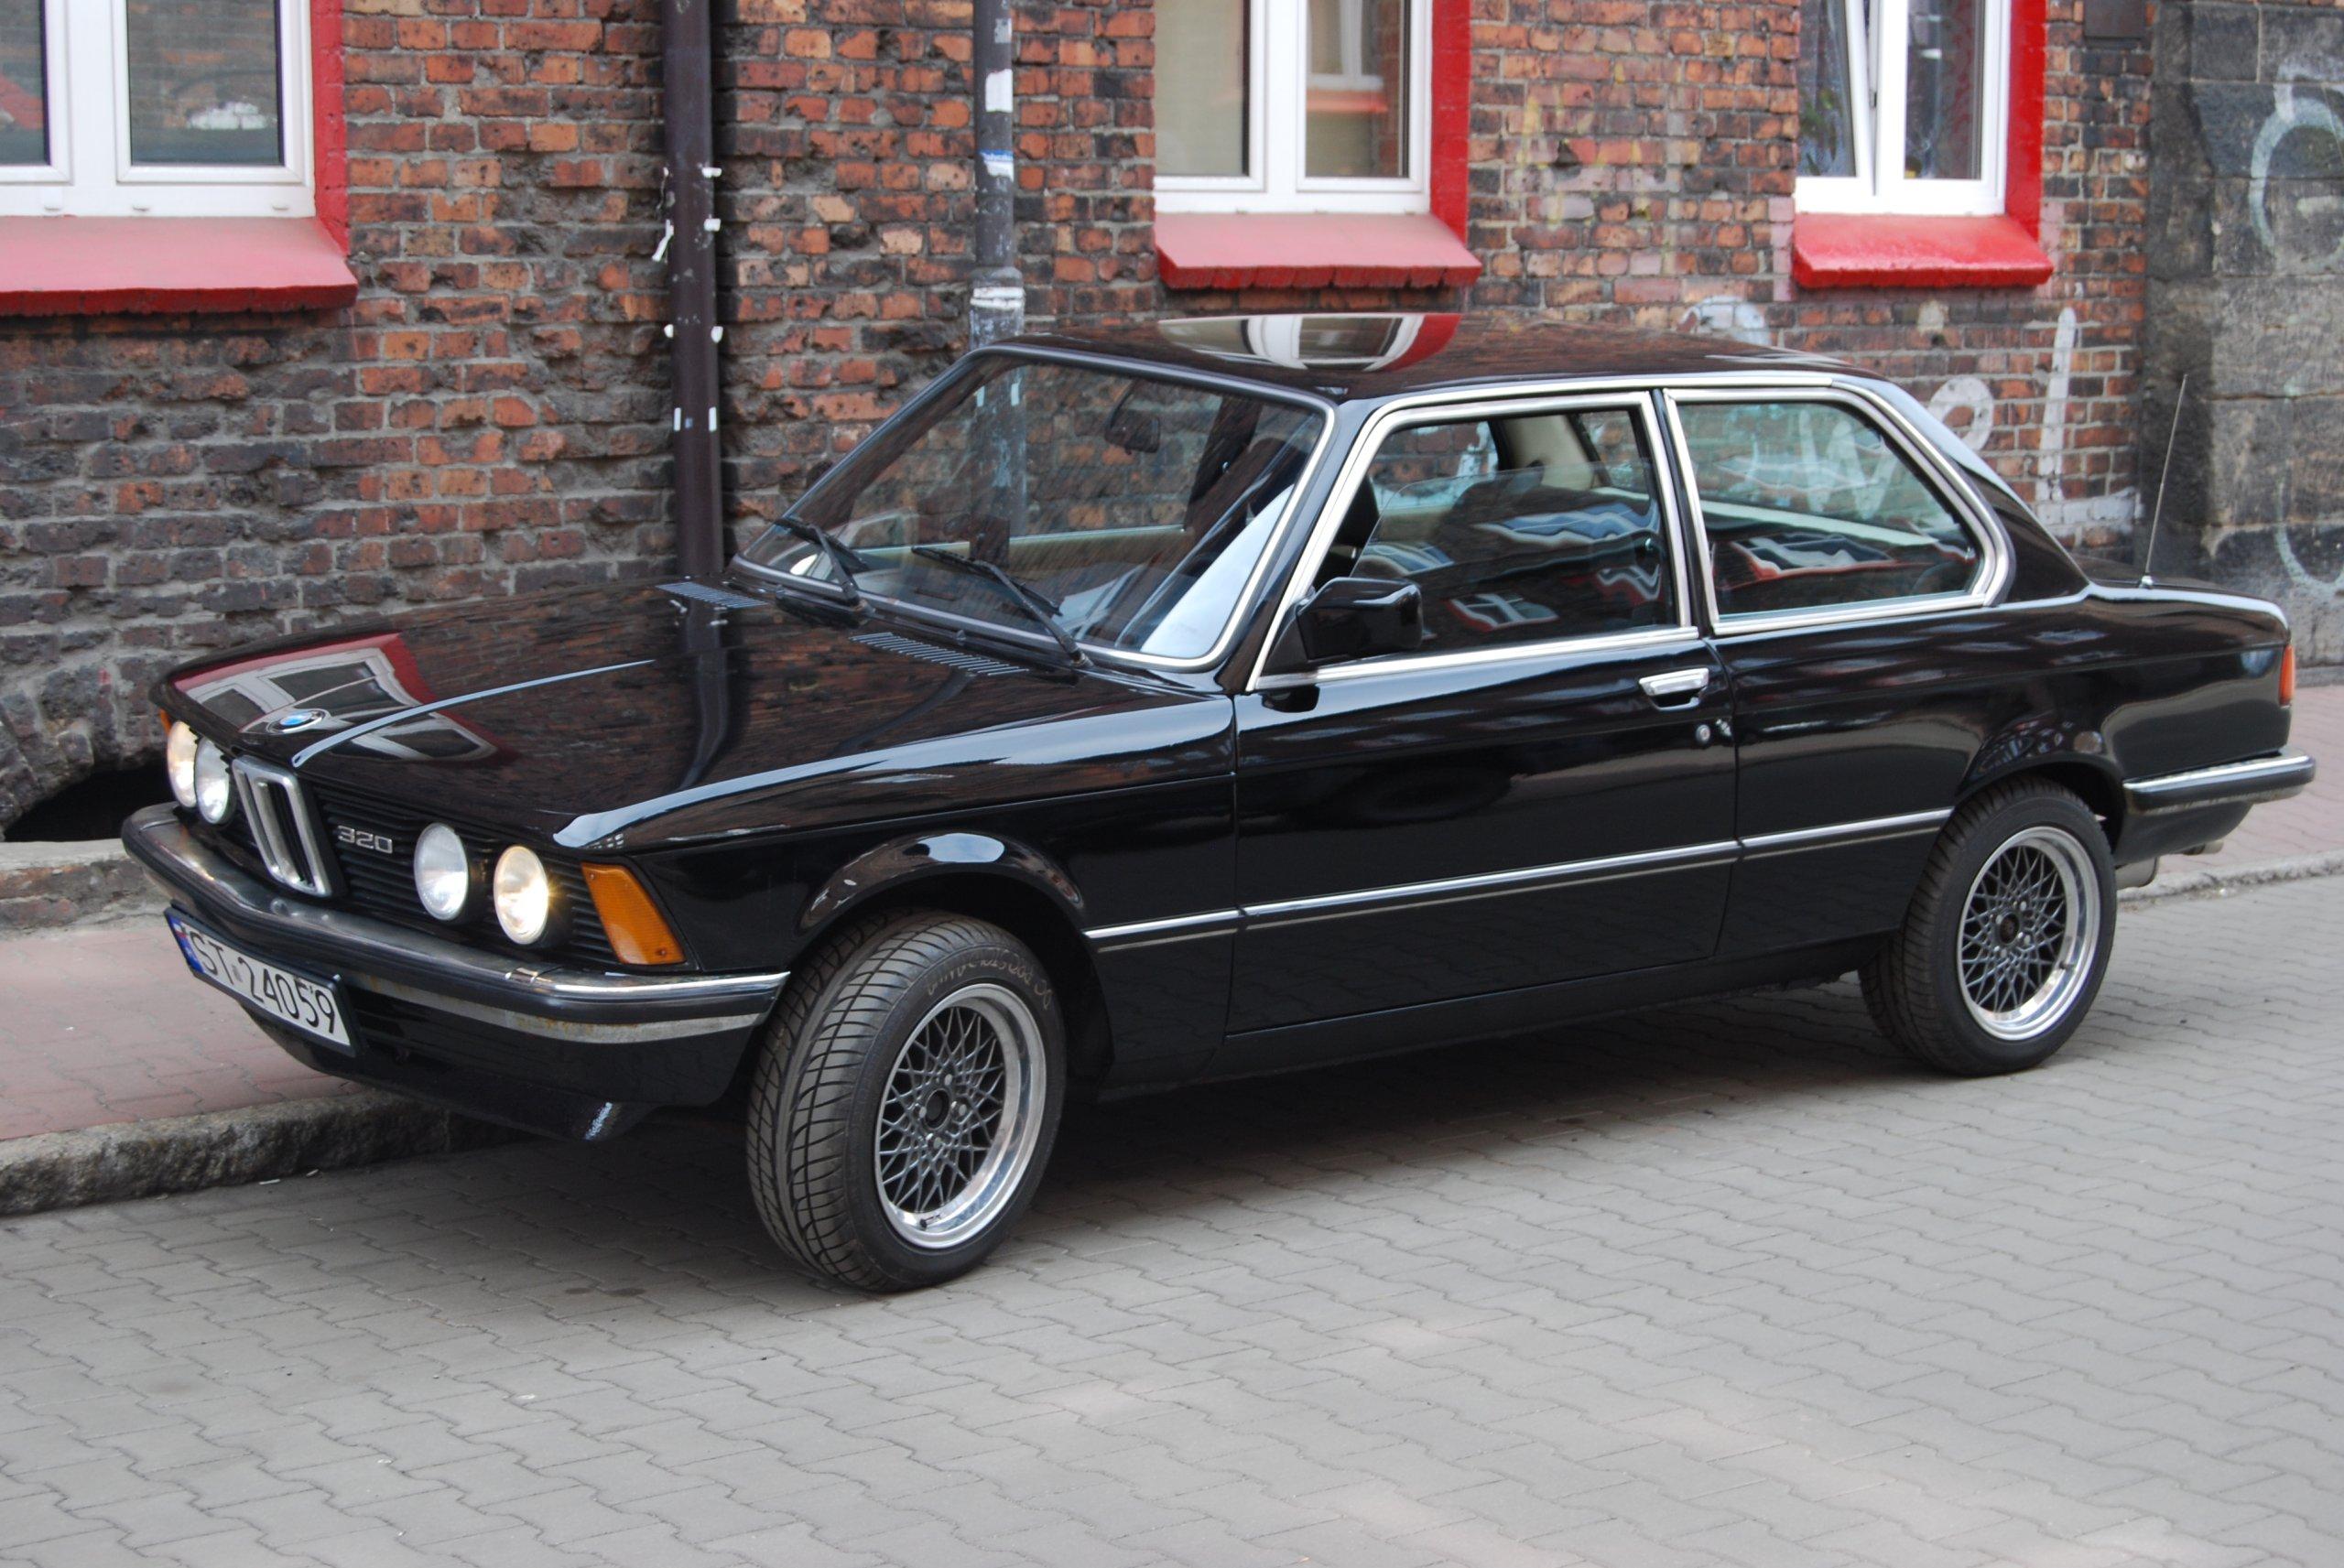 Modernistyczne BMW Seria 3 e21 Rekin - 7430336680 - oficjalne archiwum allegro SV11